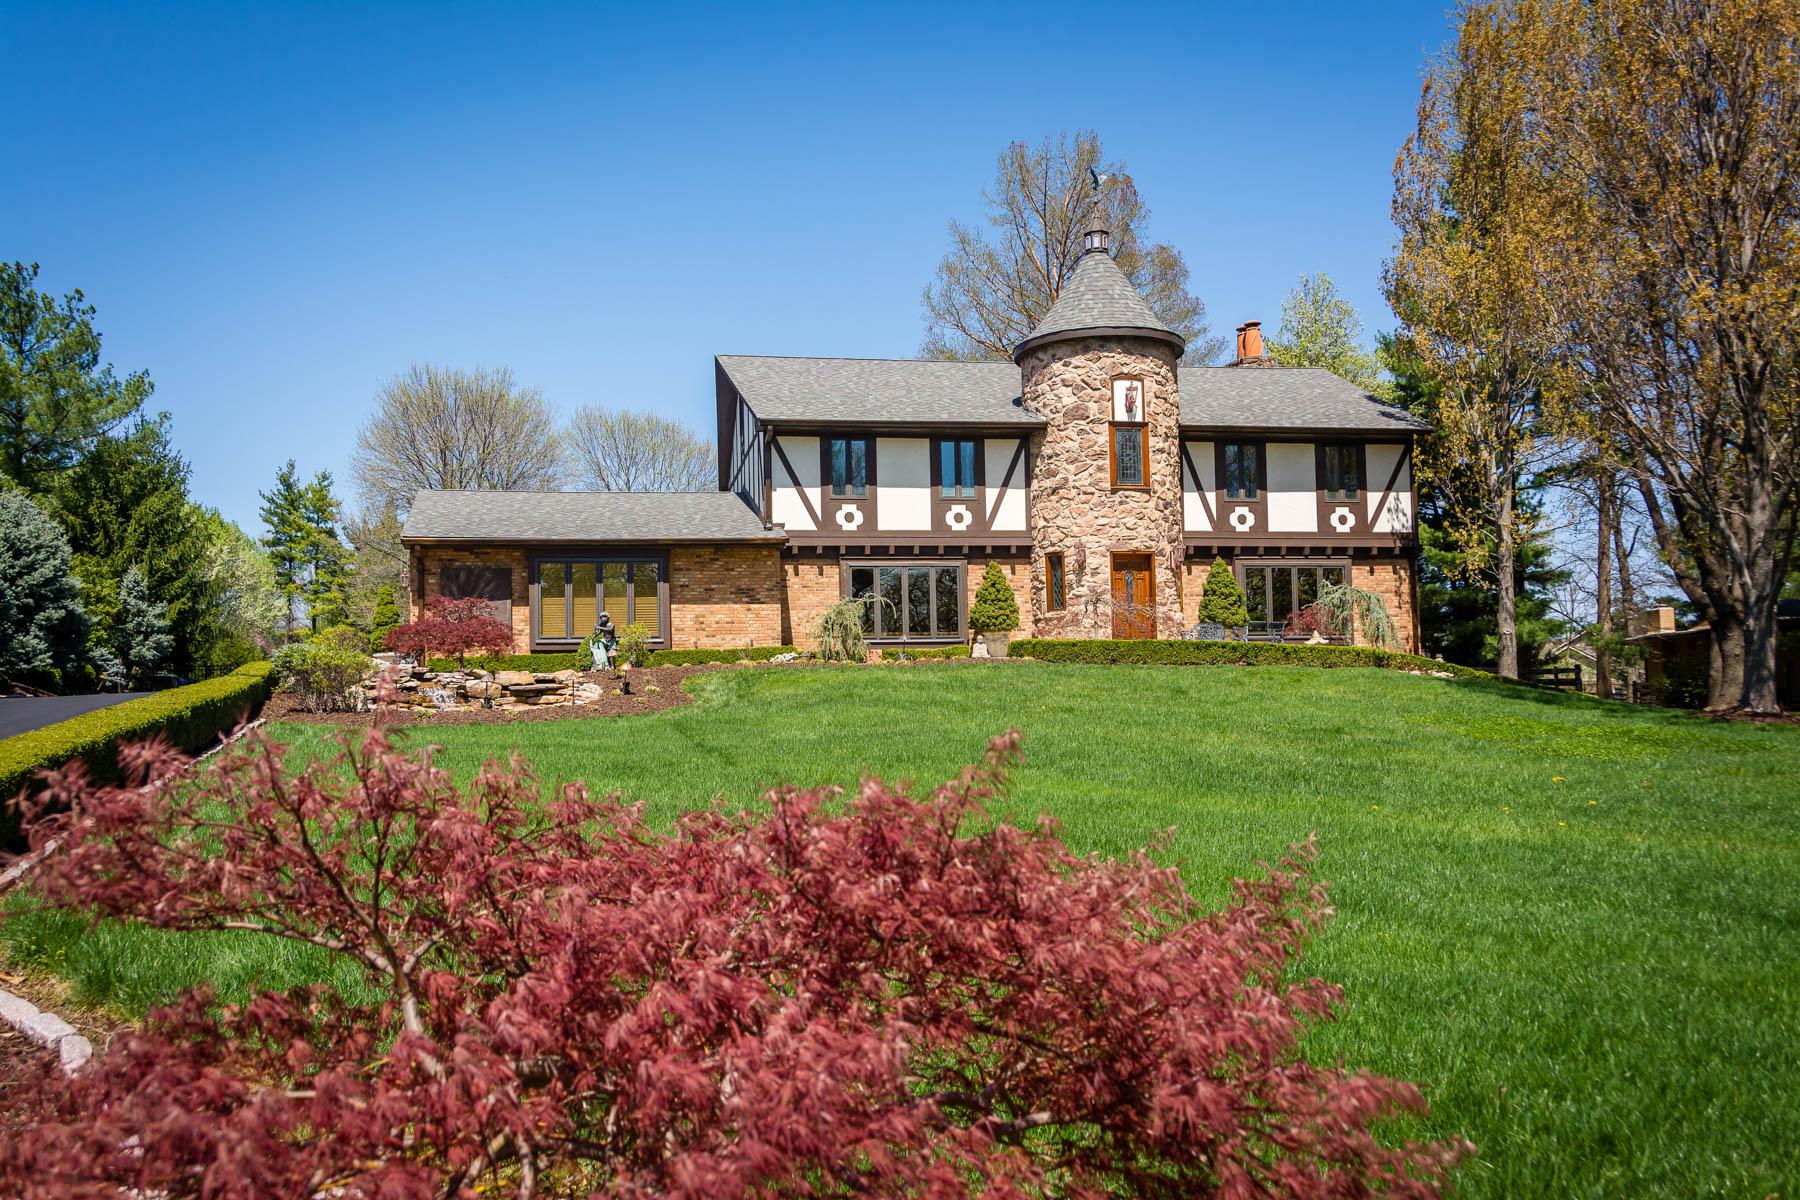 Casa Unifamiliar por un Venta en Sackston Woods 22 Sackston Woods Lane Creve Coeur, Missouri 63141 Estados Unidos